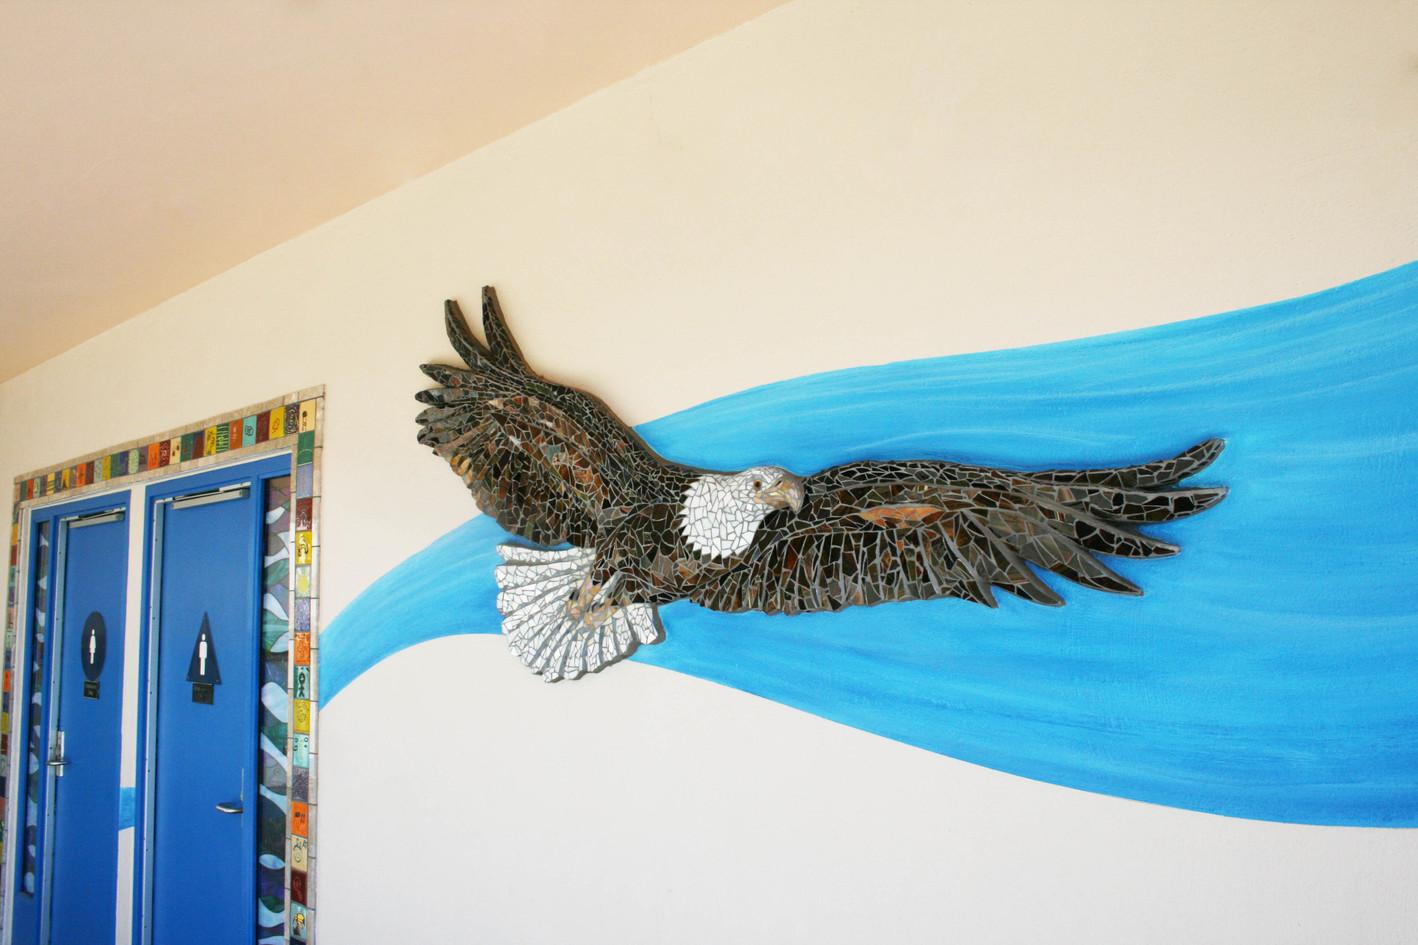 Mosaic eagle logo at Harding Elementary School